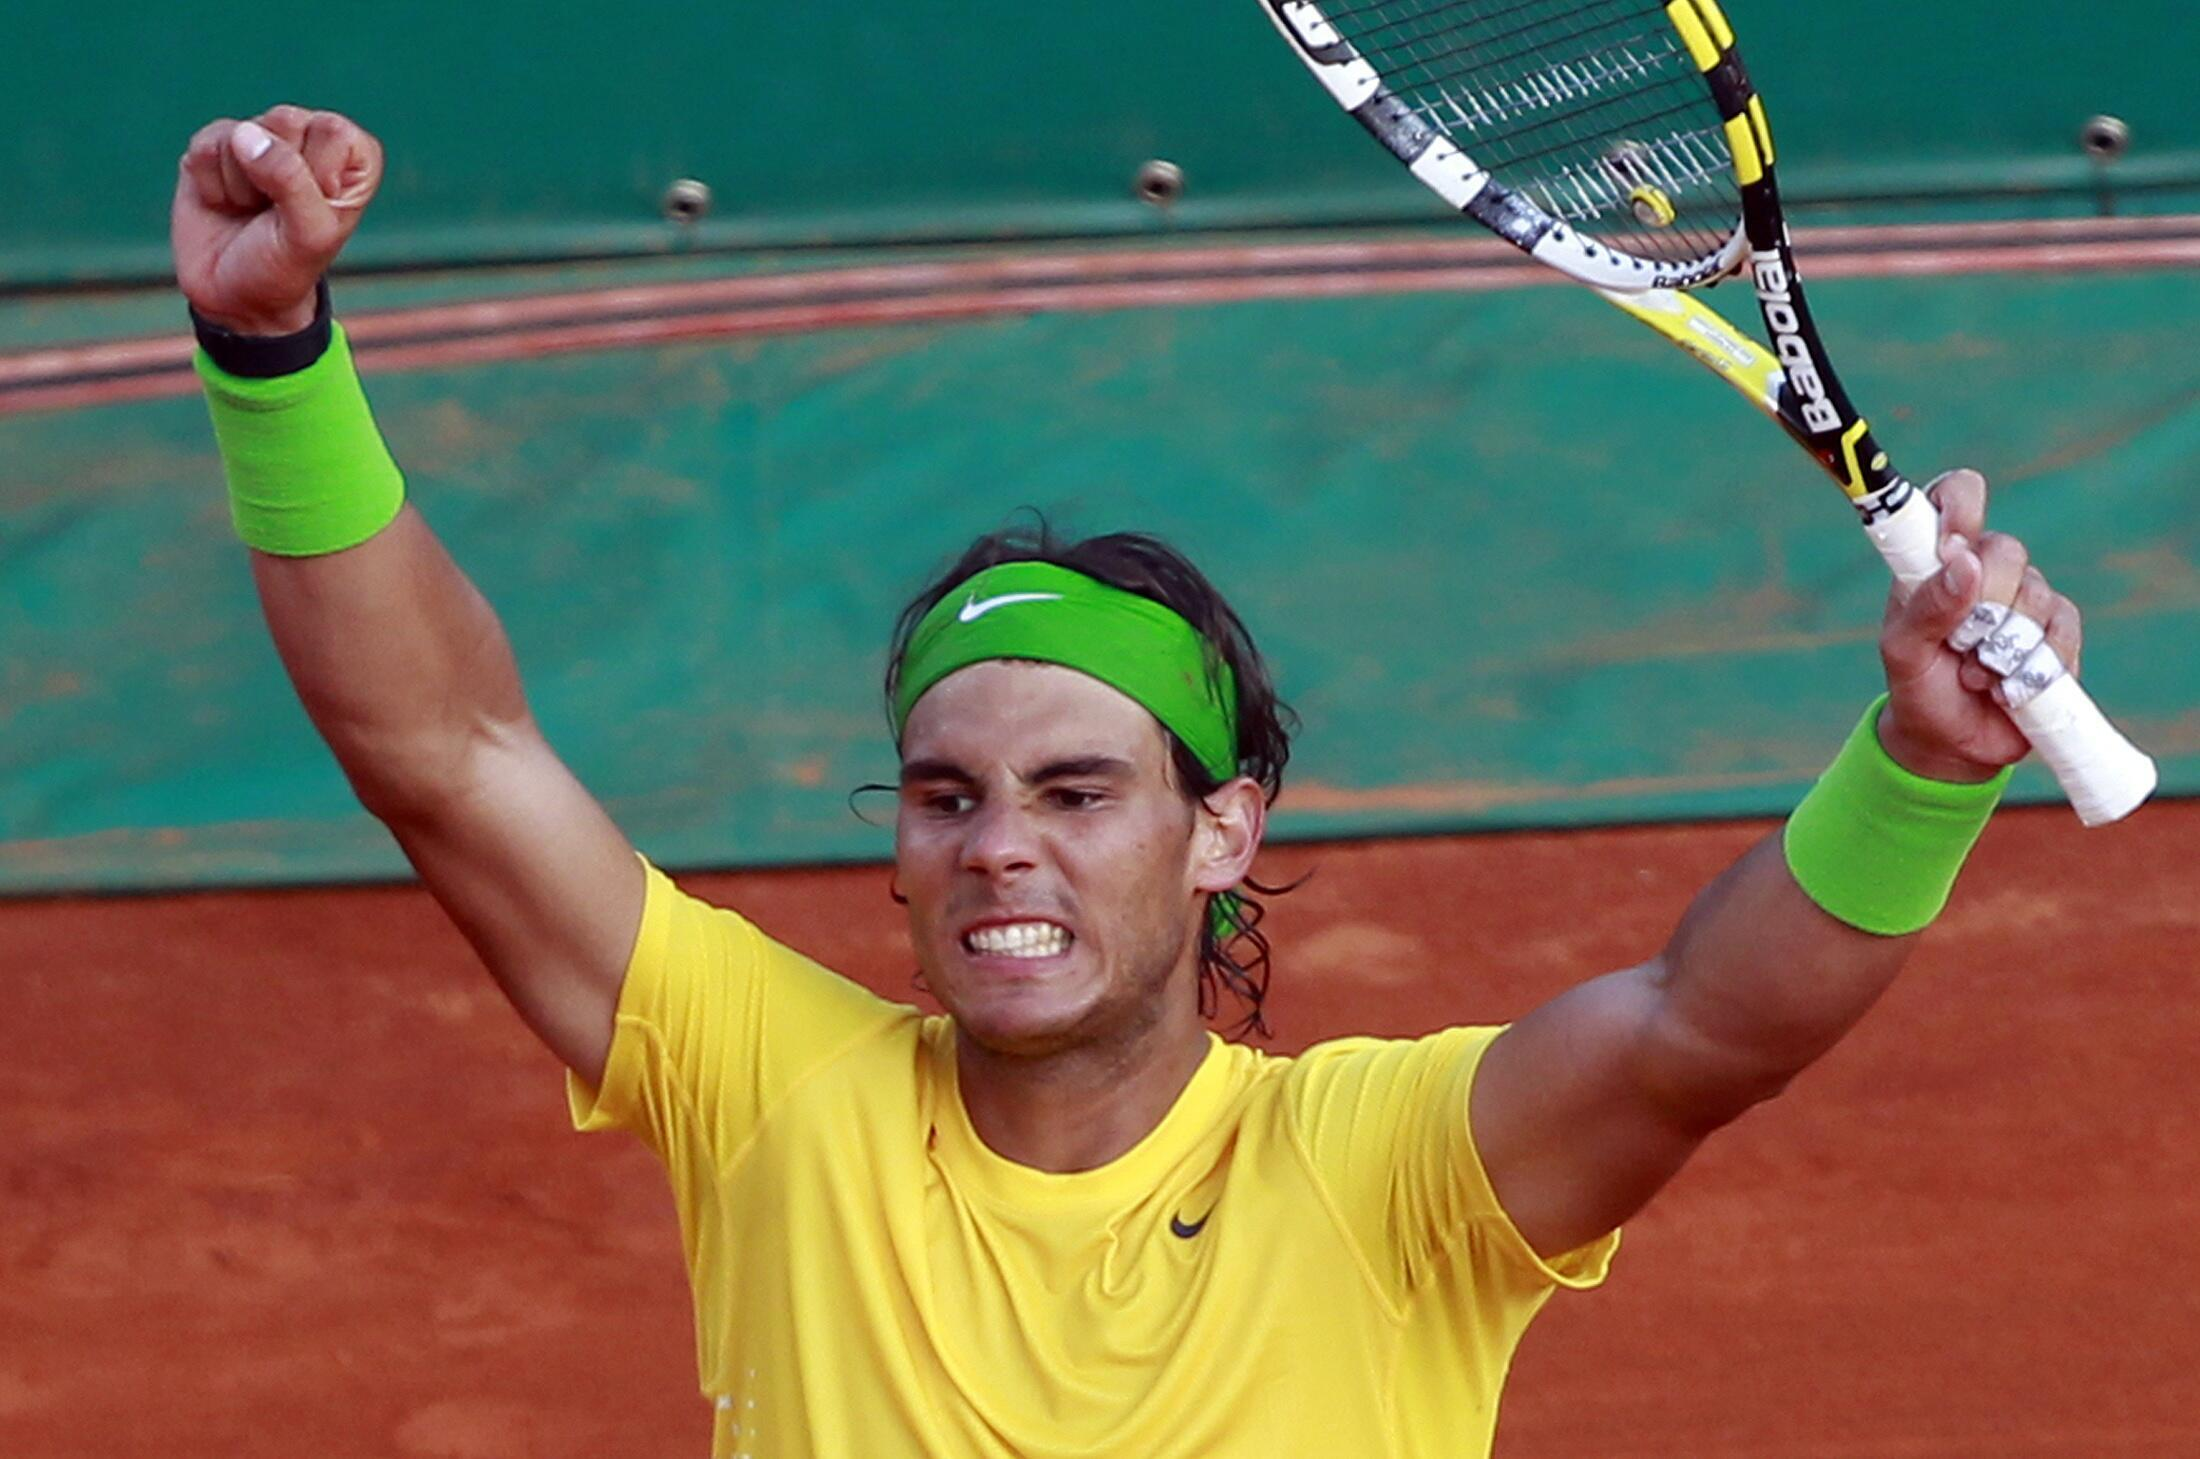 Rafael Nadal   vitorioso, recentemente  em Monte Carlo